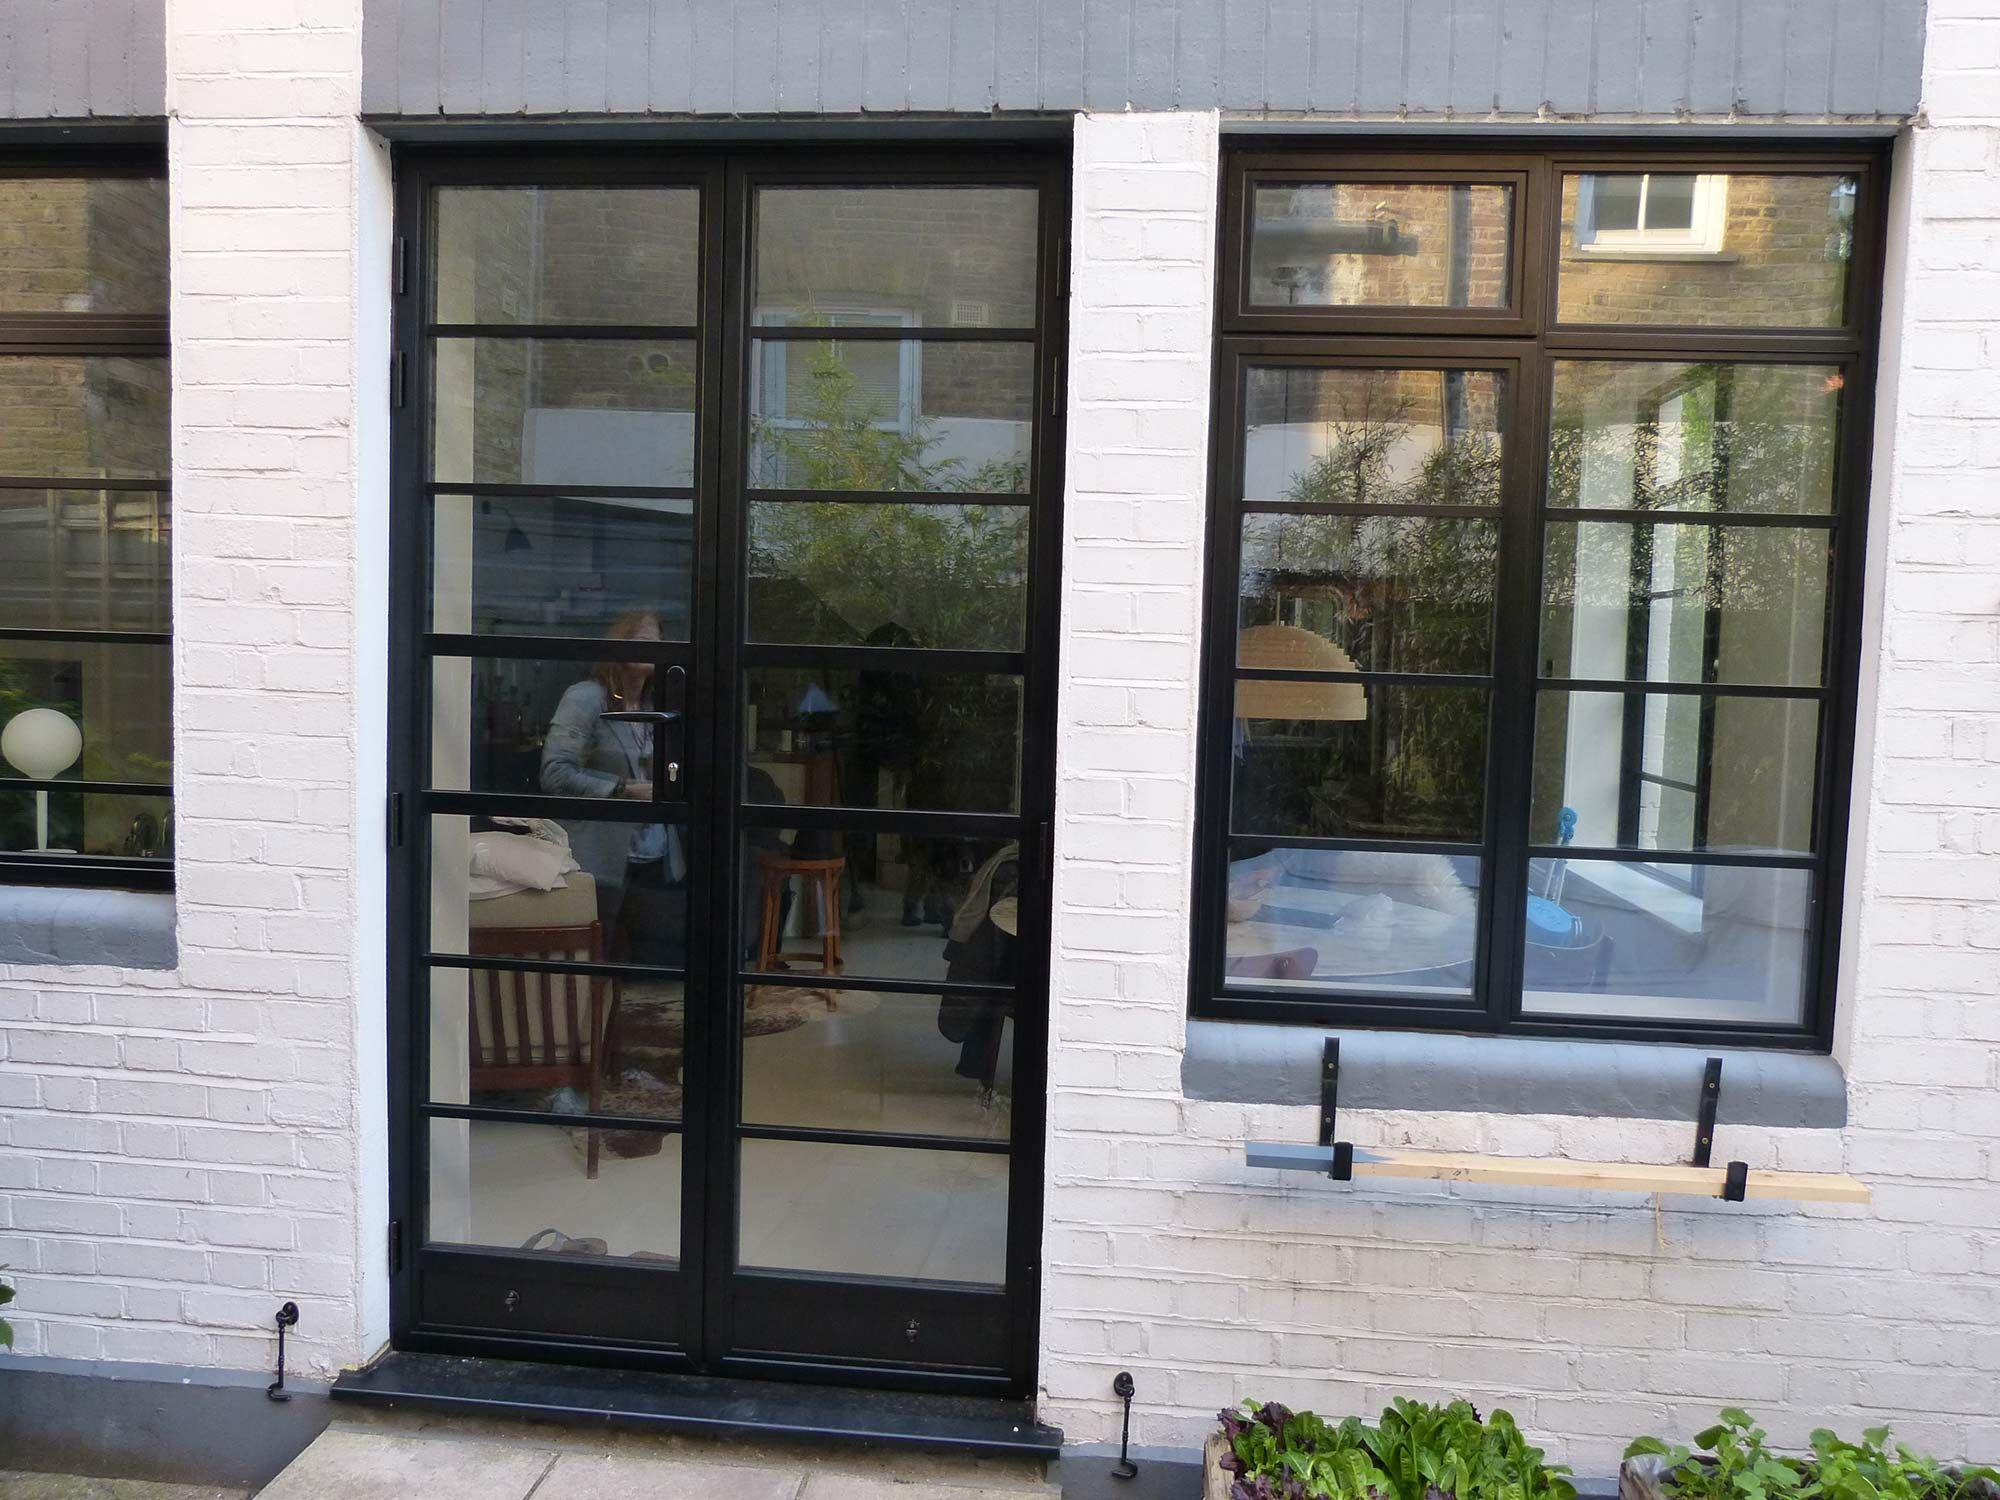 Pin By Amy Judd On H Ryan Studio Doors Windows Aluminium French Doors French Doors French Doors Exterior